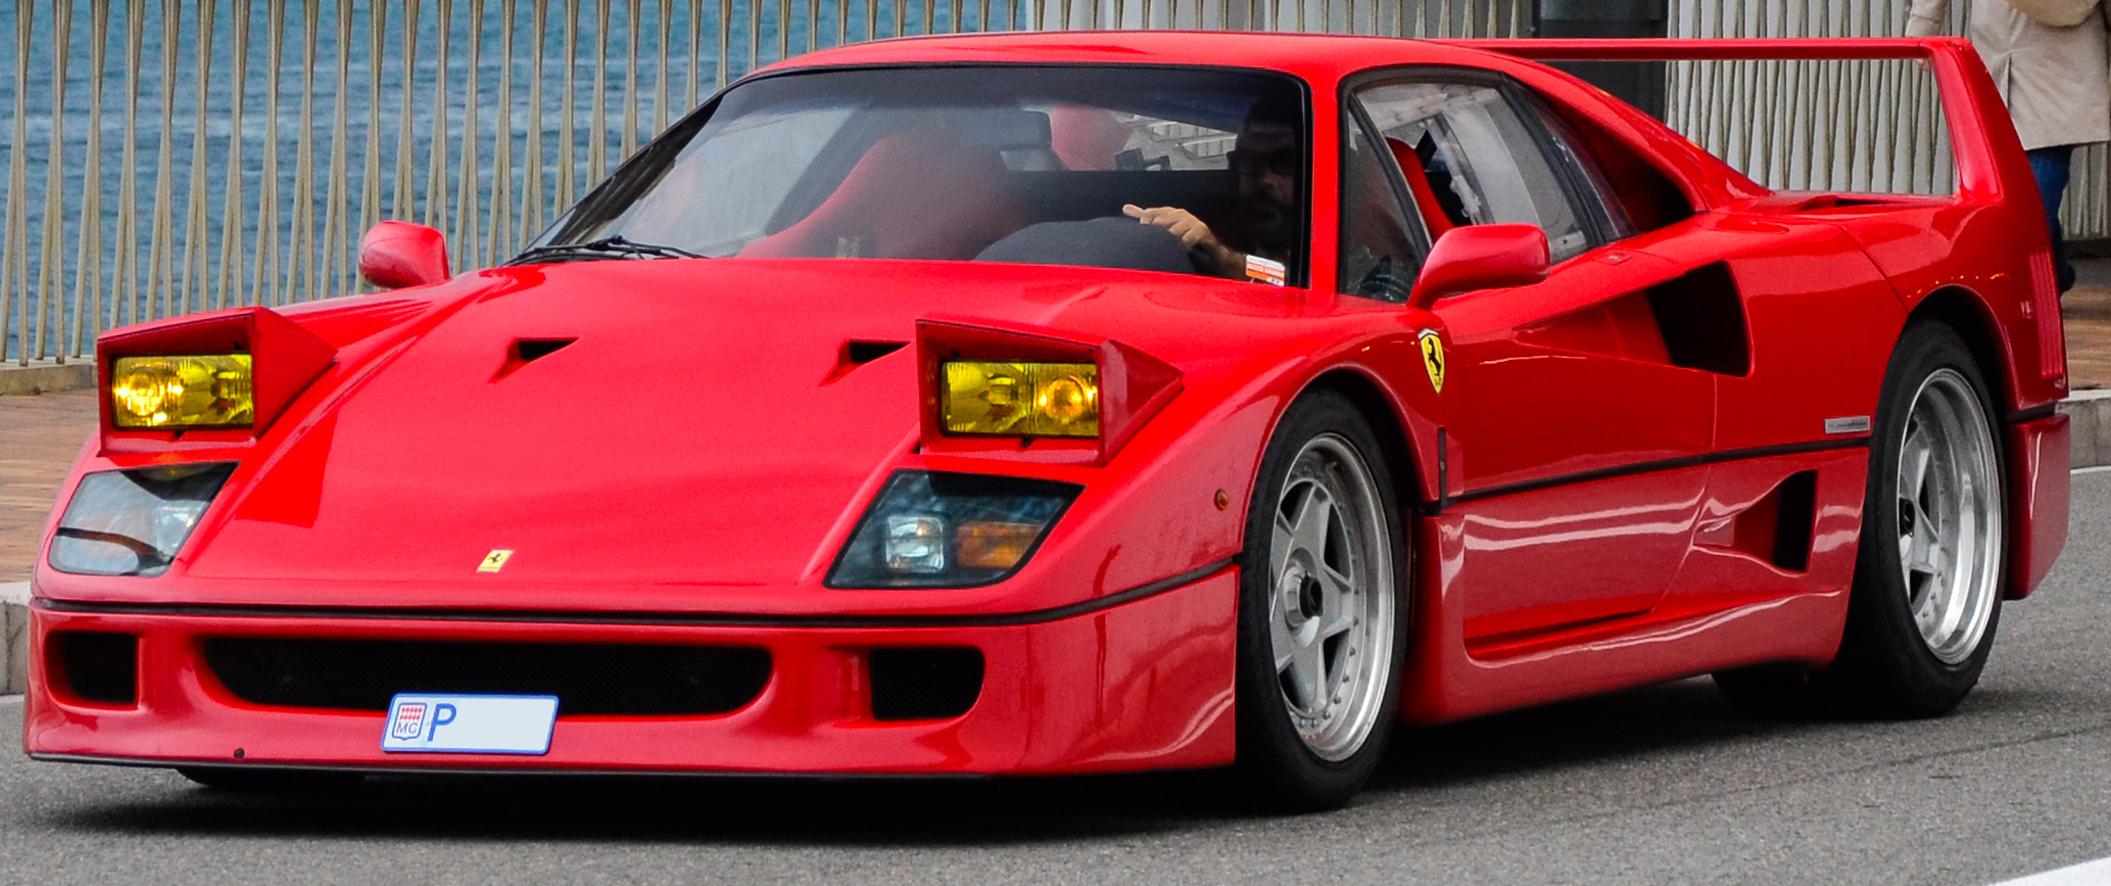 Ferrari_F40_(8716133845)_(cropped).jpg